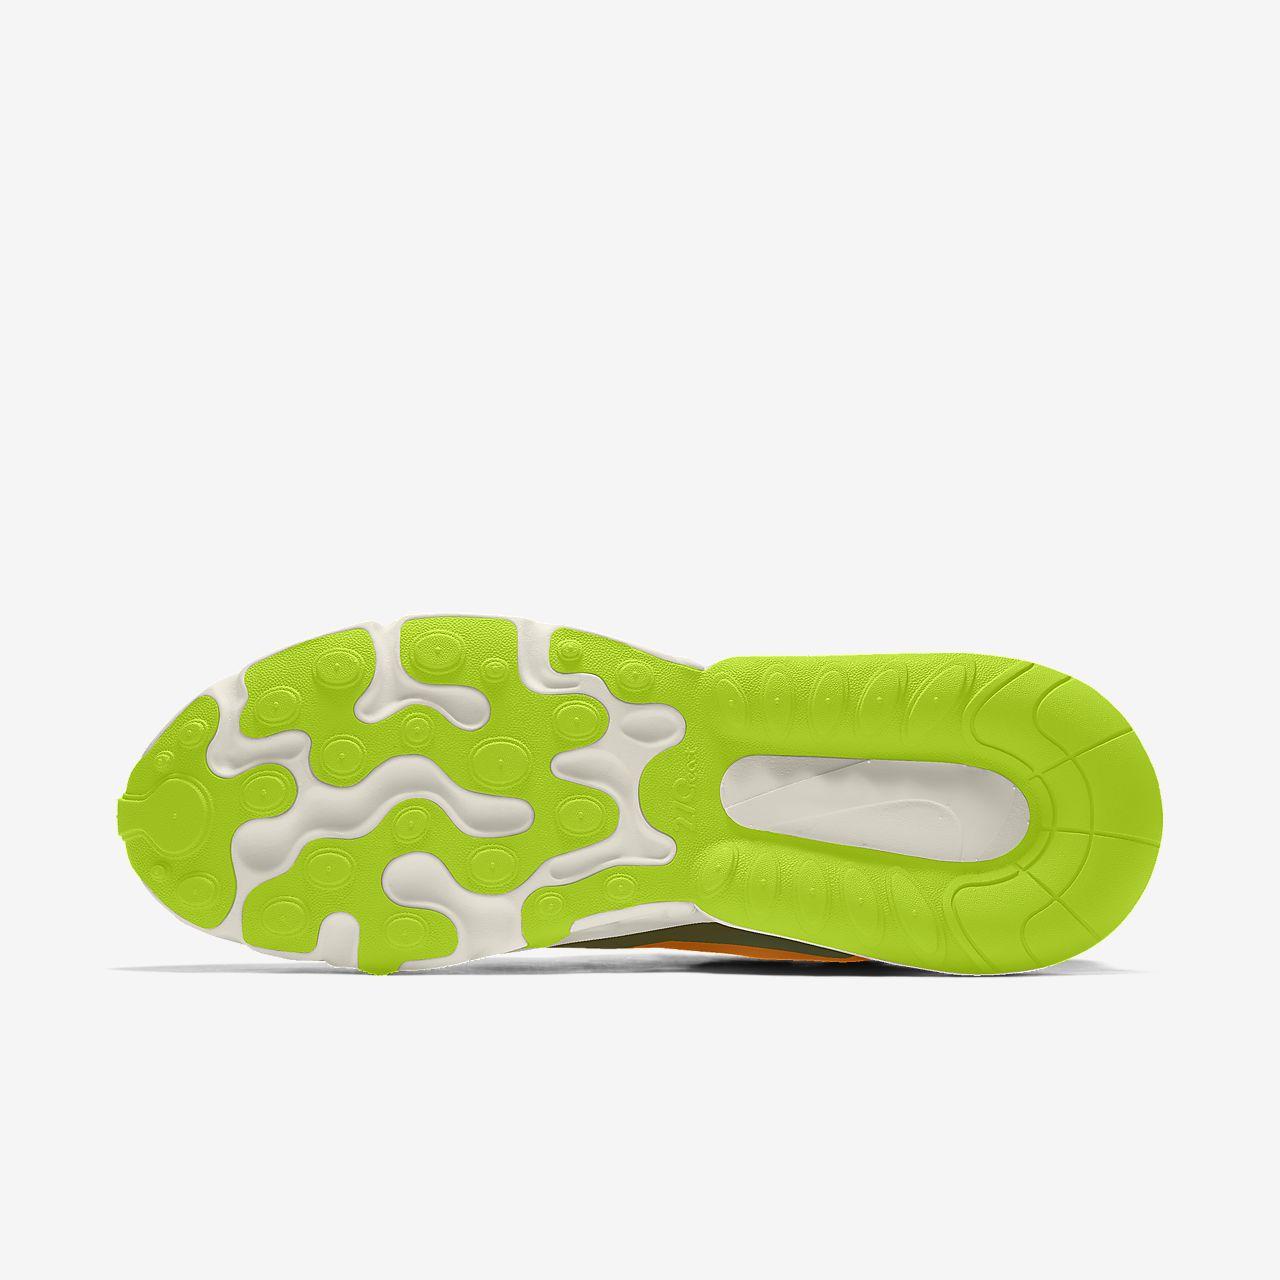 Nike Air Max 270 React By You Custom Shoe